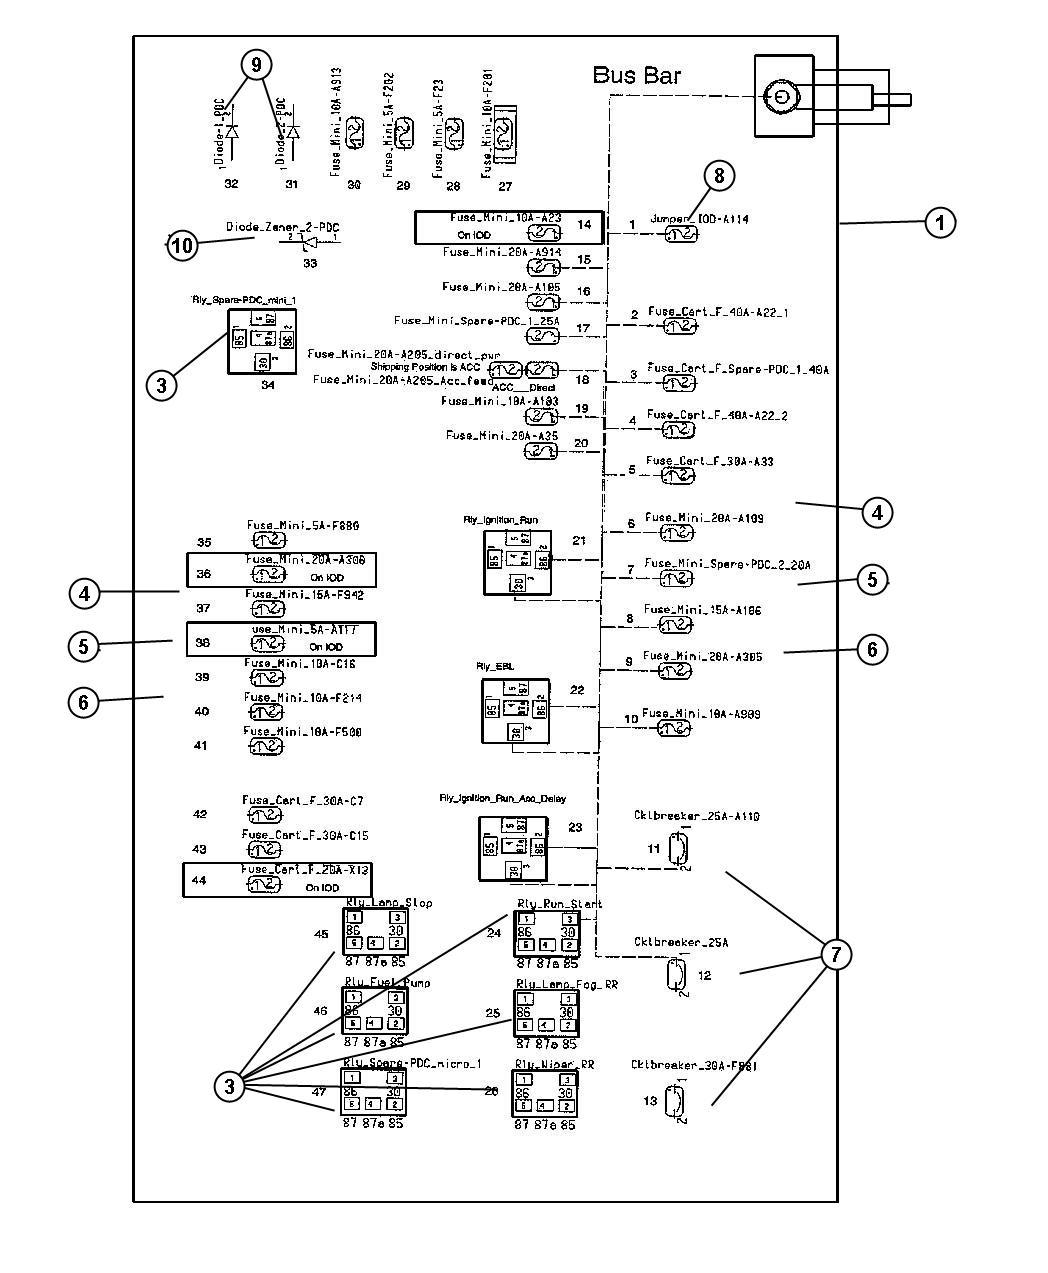 [SCHEMATICS_49CH]  2006 Dodge Magnum Fuse Box Layout - 1994 Toyota Celica Stereo Wiring Diagram  Schematic for Wiring Diagram Schematics | Fuse Box Dodge Magnum 2006 |  | Wiring Diagram Schematics